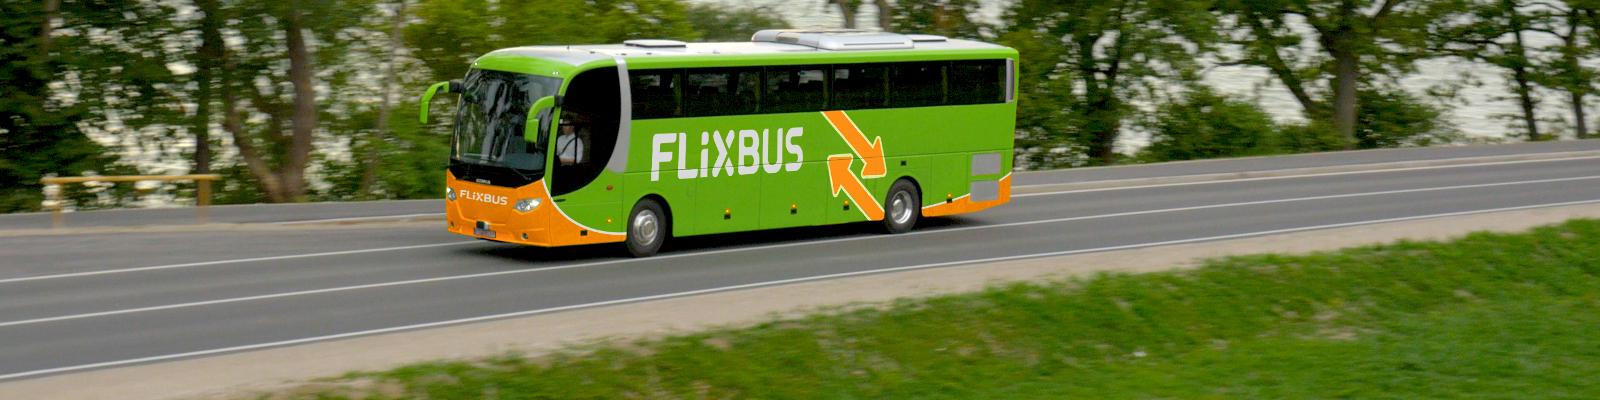 flixbus goeuro. Black Bedroom Furniture Sets. Home Design Ideas